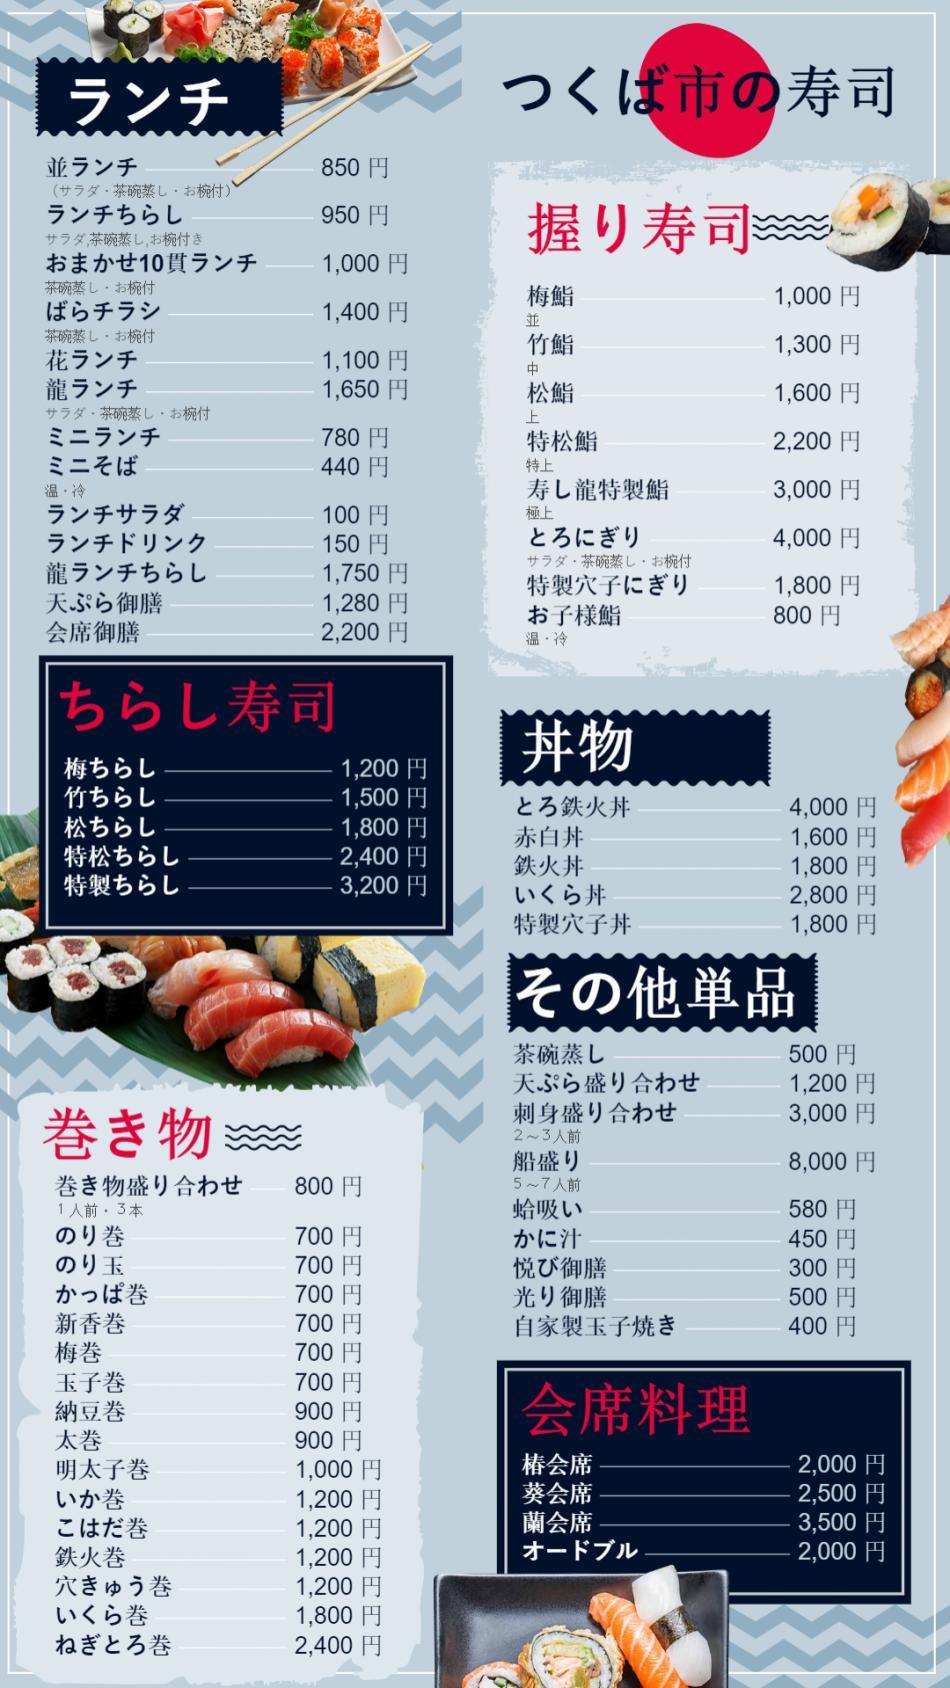 Vertical Japanese sushi menu boad from DSMenu